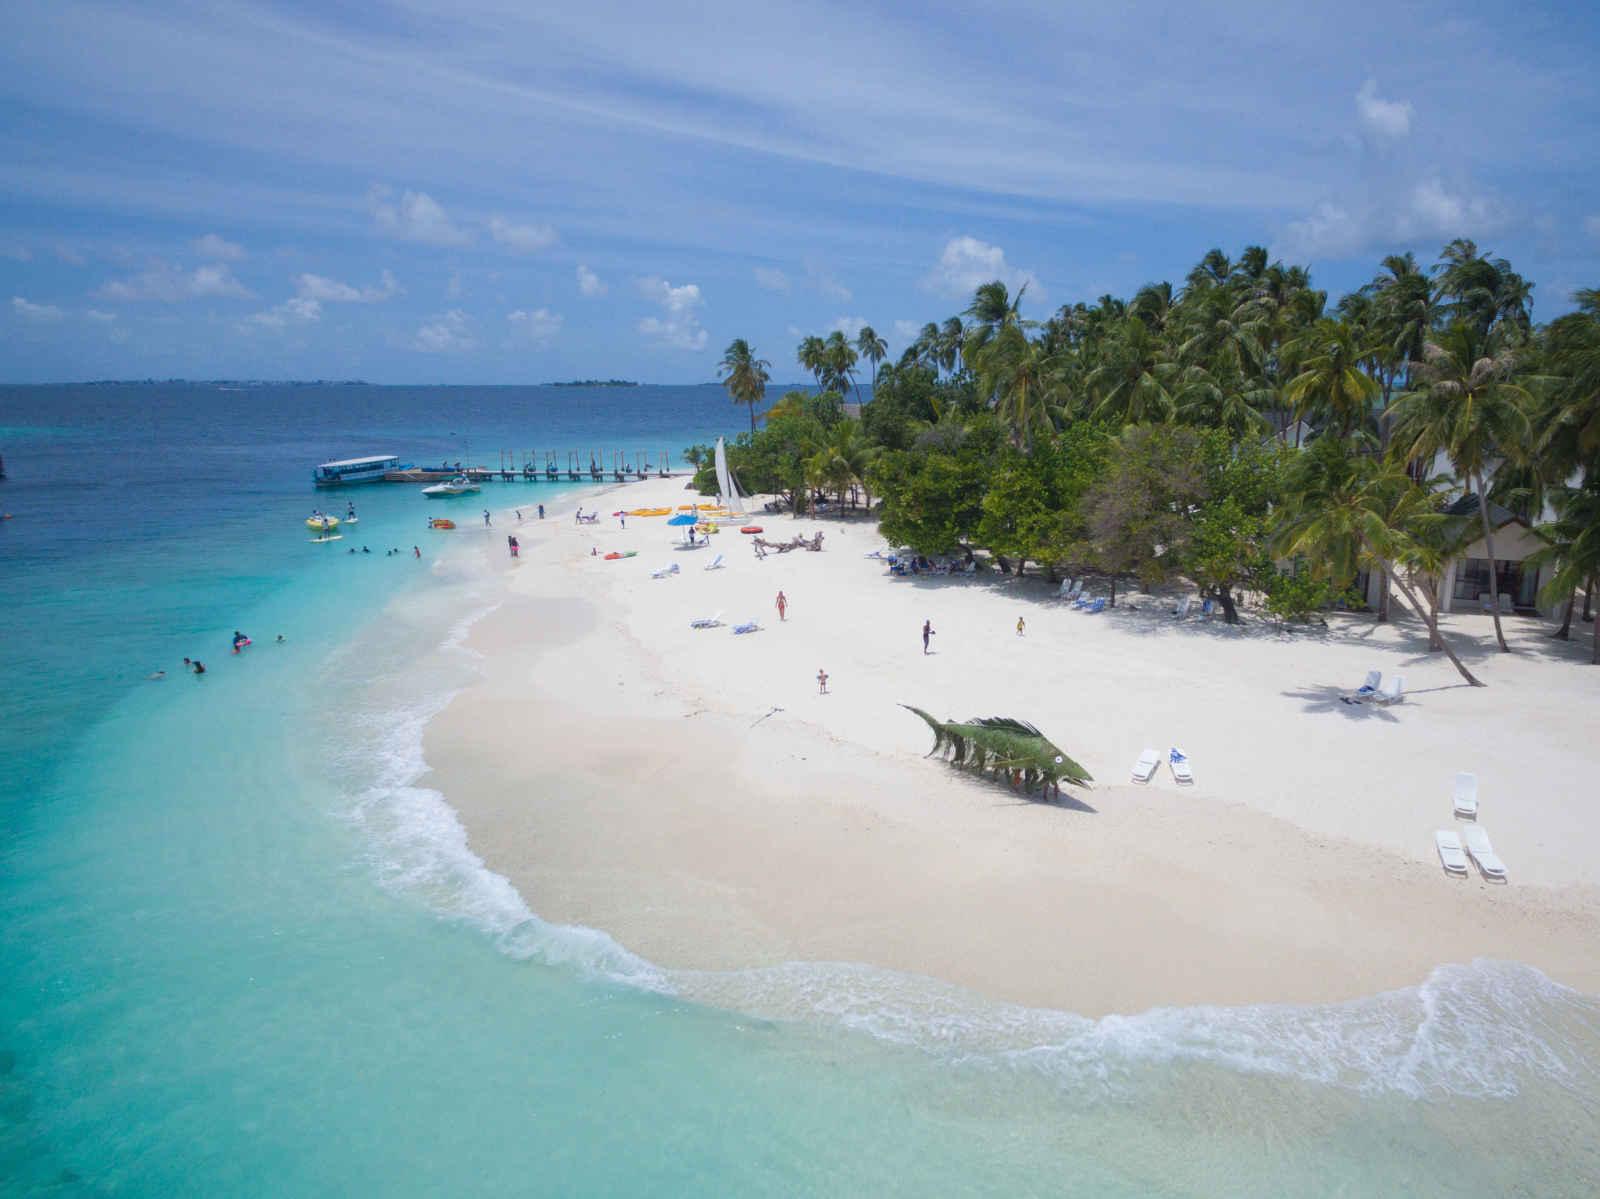 Séjour Malé - Malahini Kuda Bandos Resort - 4*